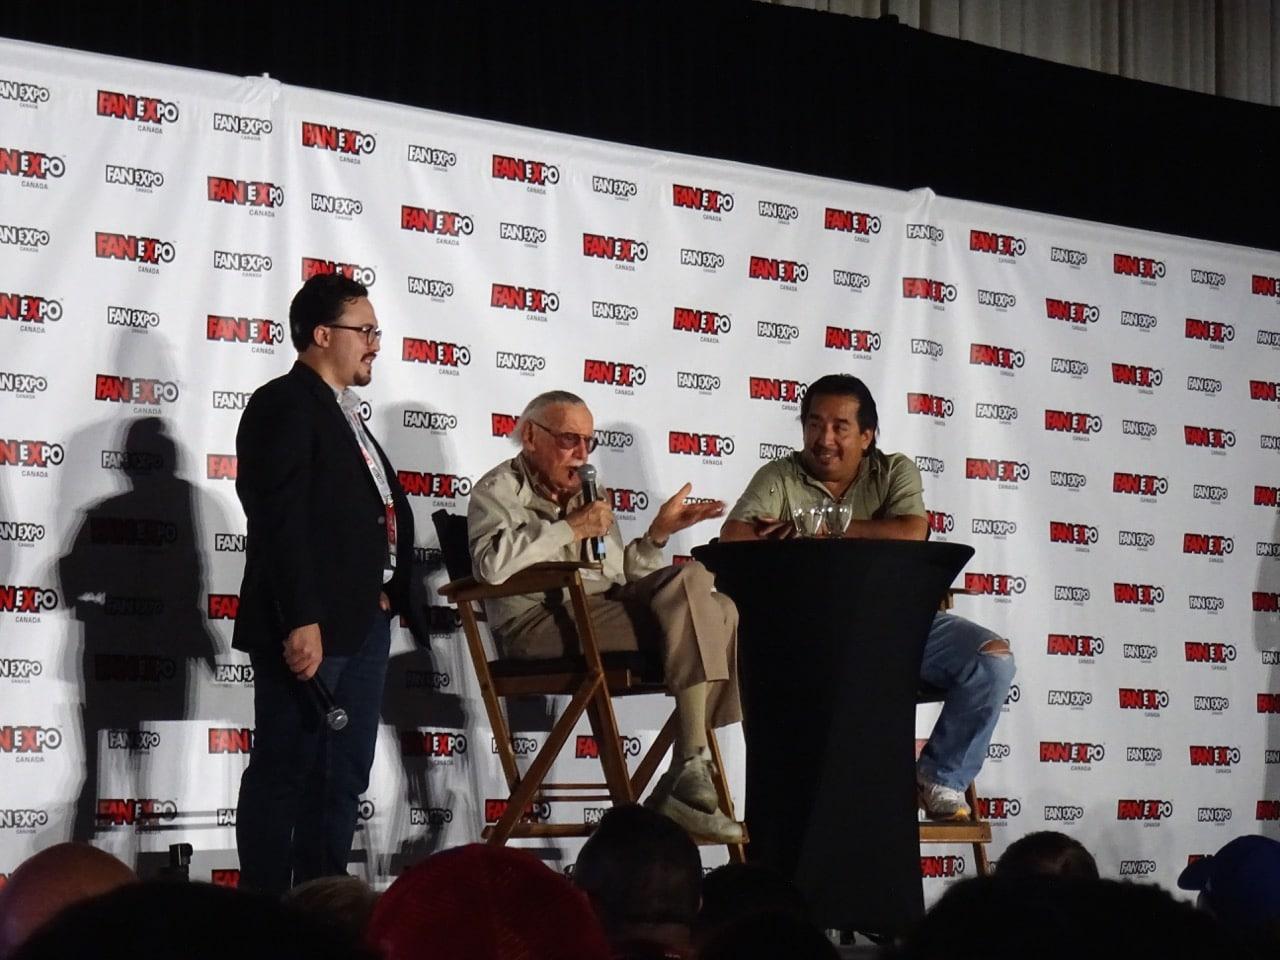 Marvel's Stan Lee spoke at FAN EXPO Canada 2016 in Toronto.